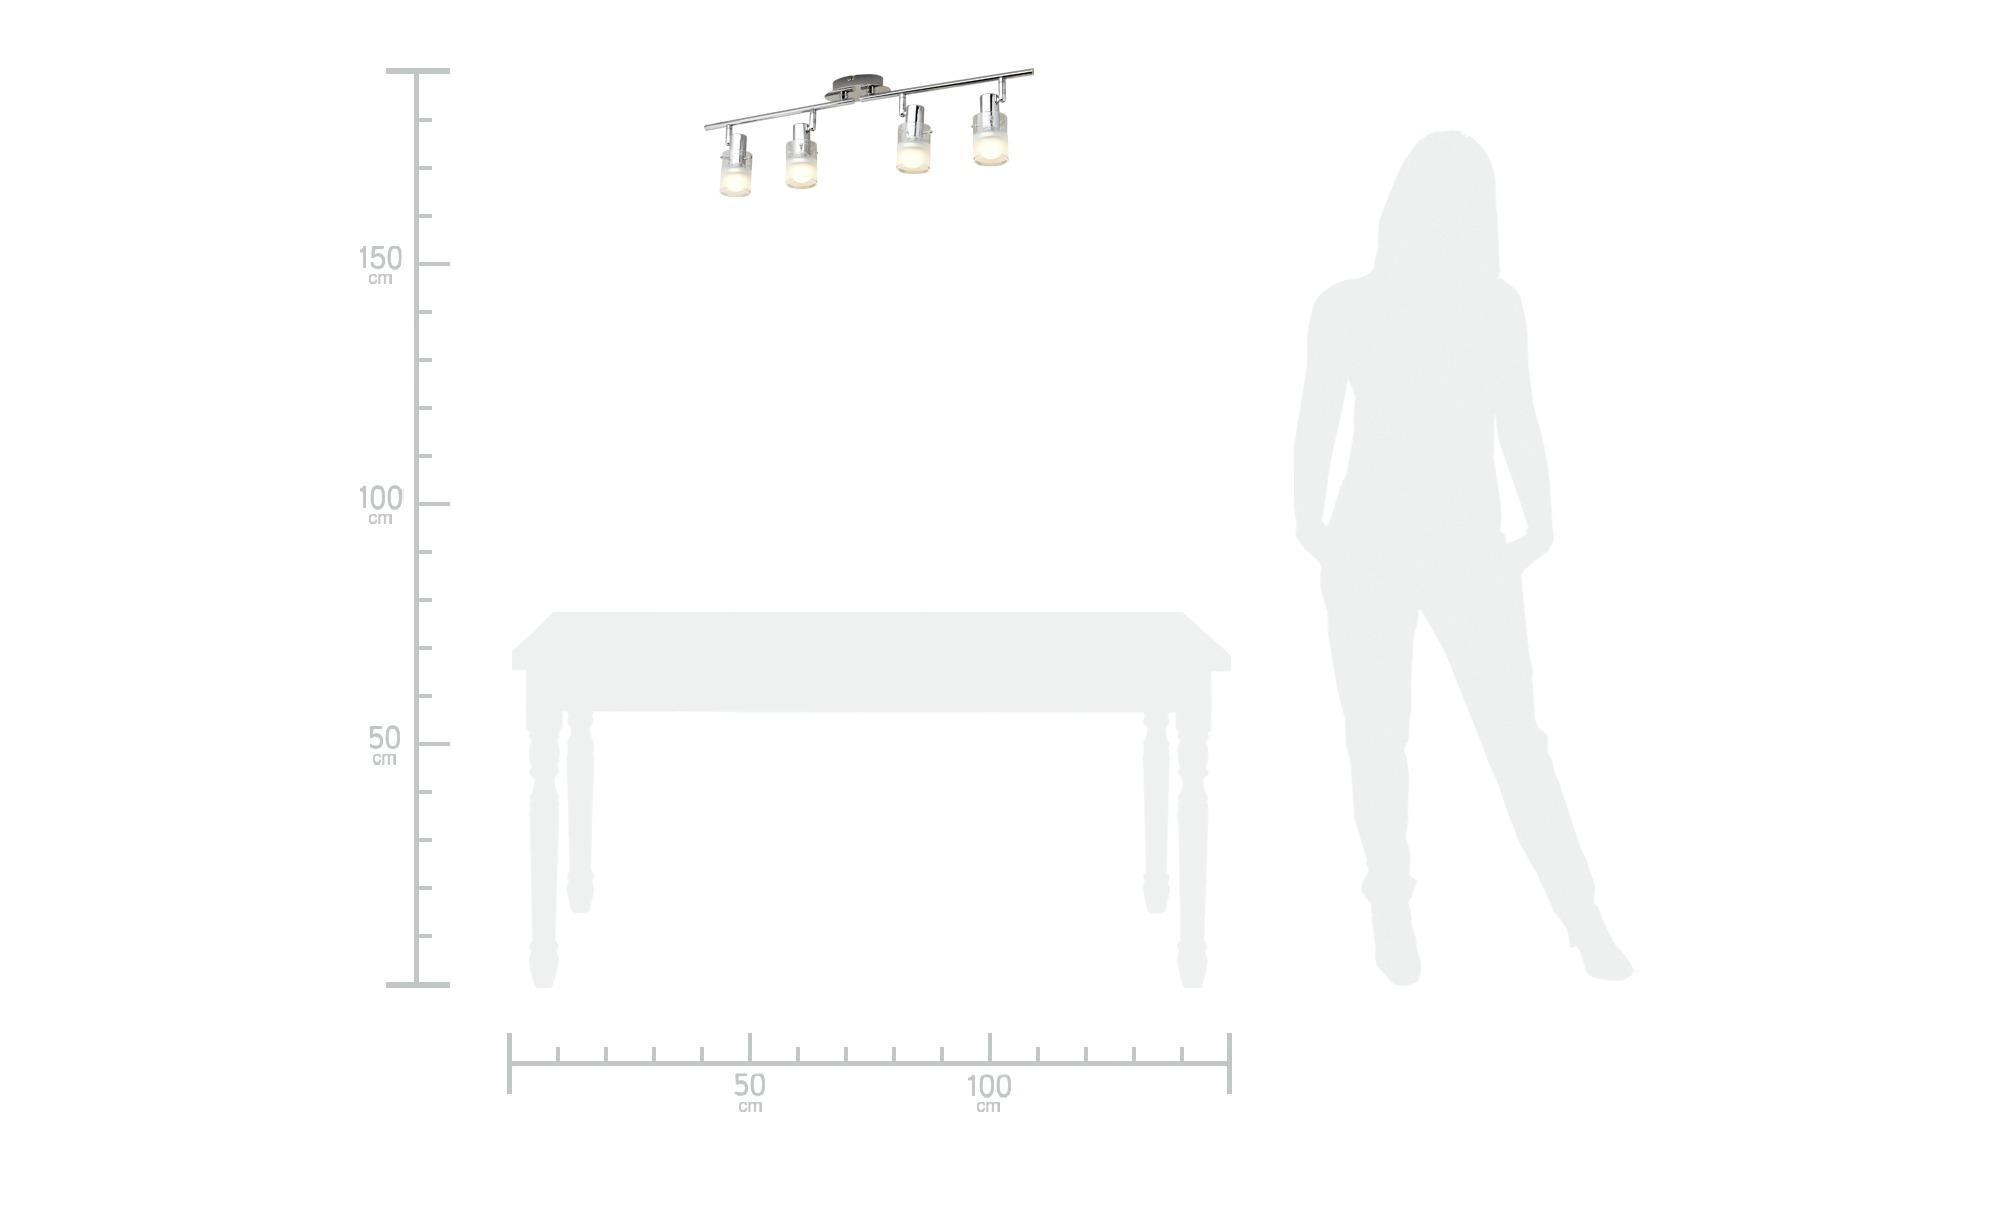 KHG LED- Deckenstrahler, 4-flammig mit Glas ¦ silber ¦ Maße (cm): B: 13,5 H: 8 Lampen & Leuchten > LED-Leuchten > LED-Strahler & Spots - Höffner